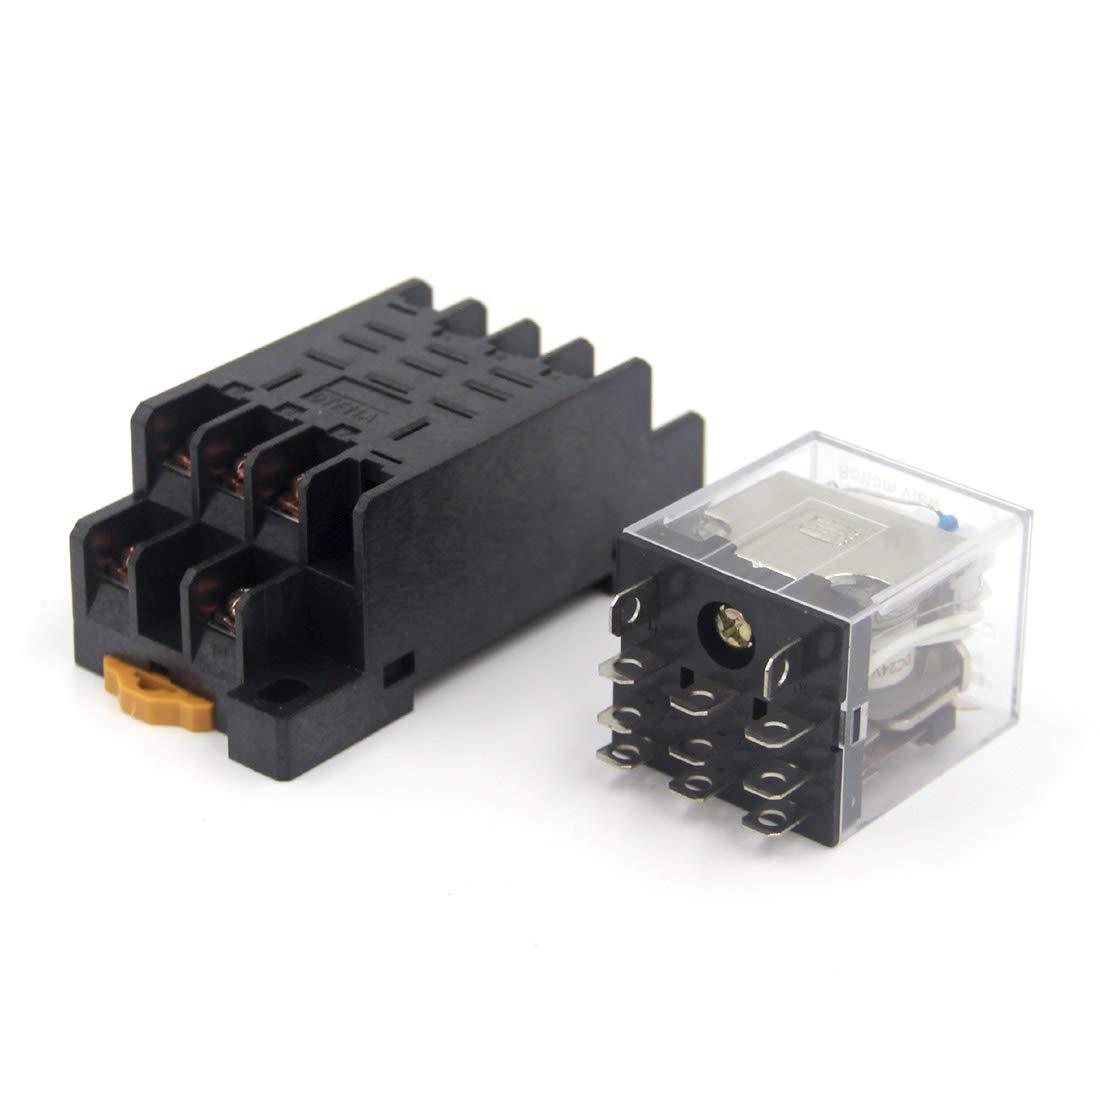 Woljay HH63P AC 380V Spule 3PDT 11 Pin Gereral Zweck Relais Kontrollleuchte Elektromagnetisches Leistungsrelais mit Sockel